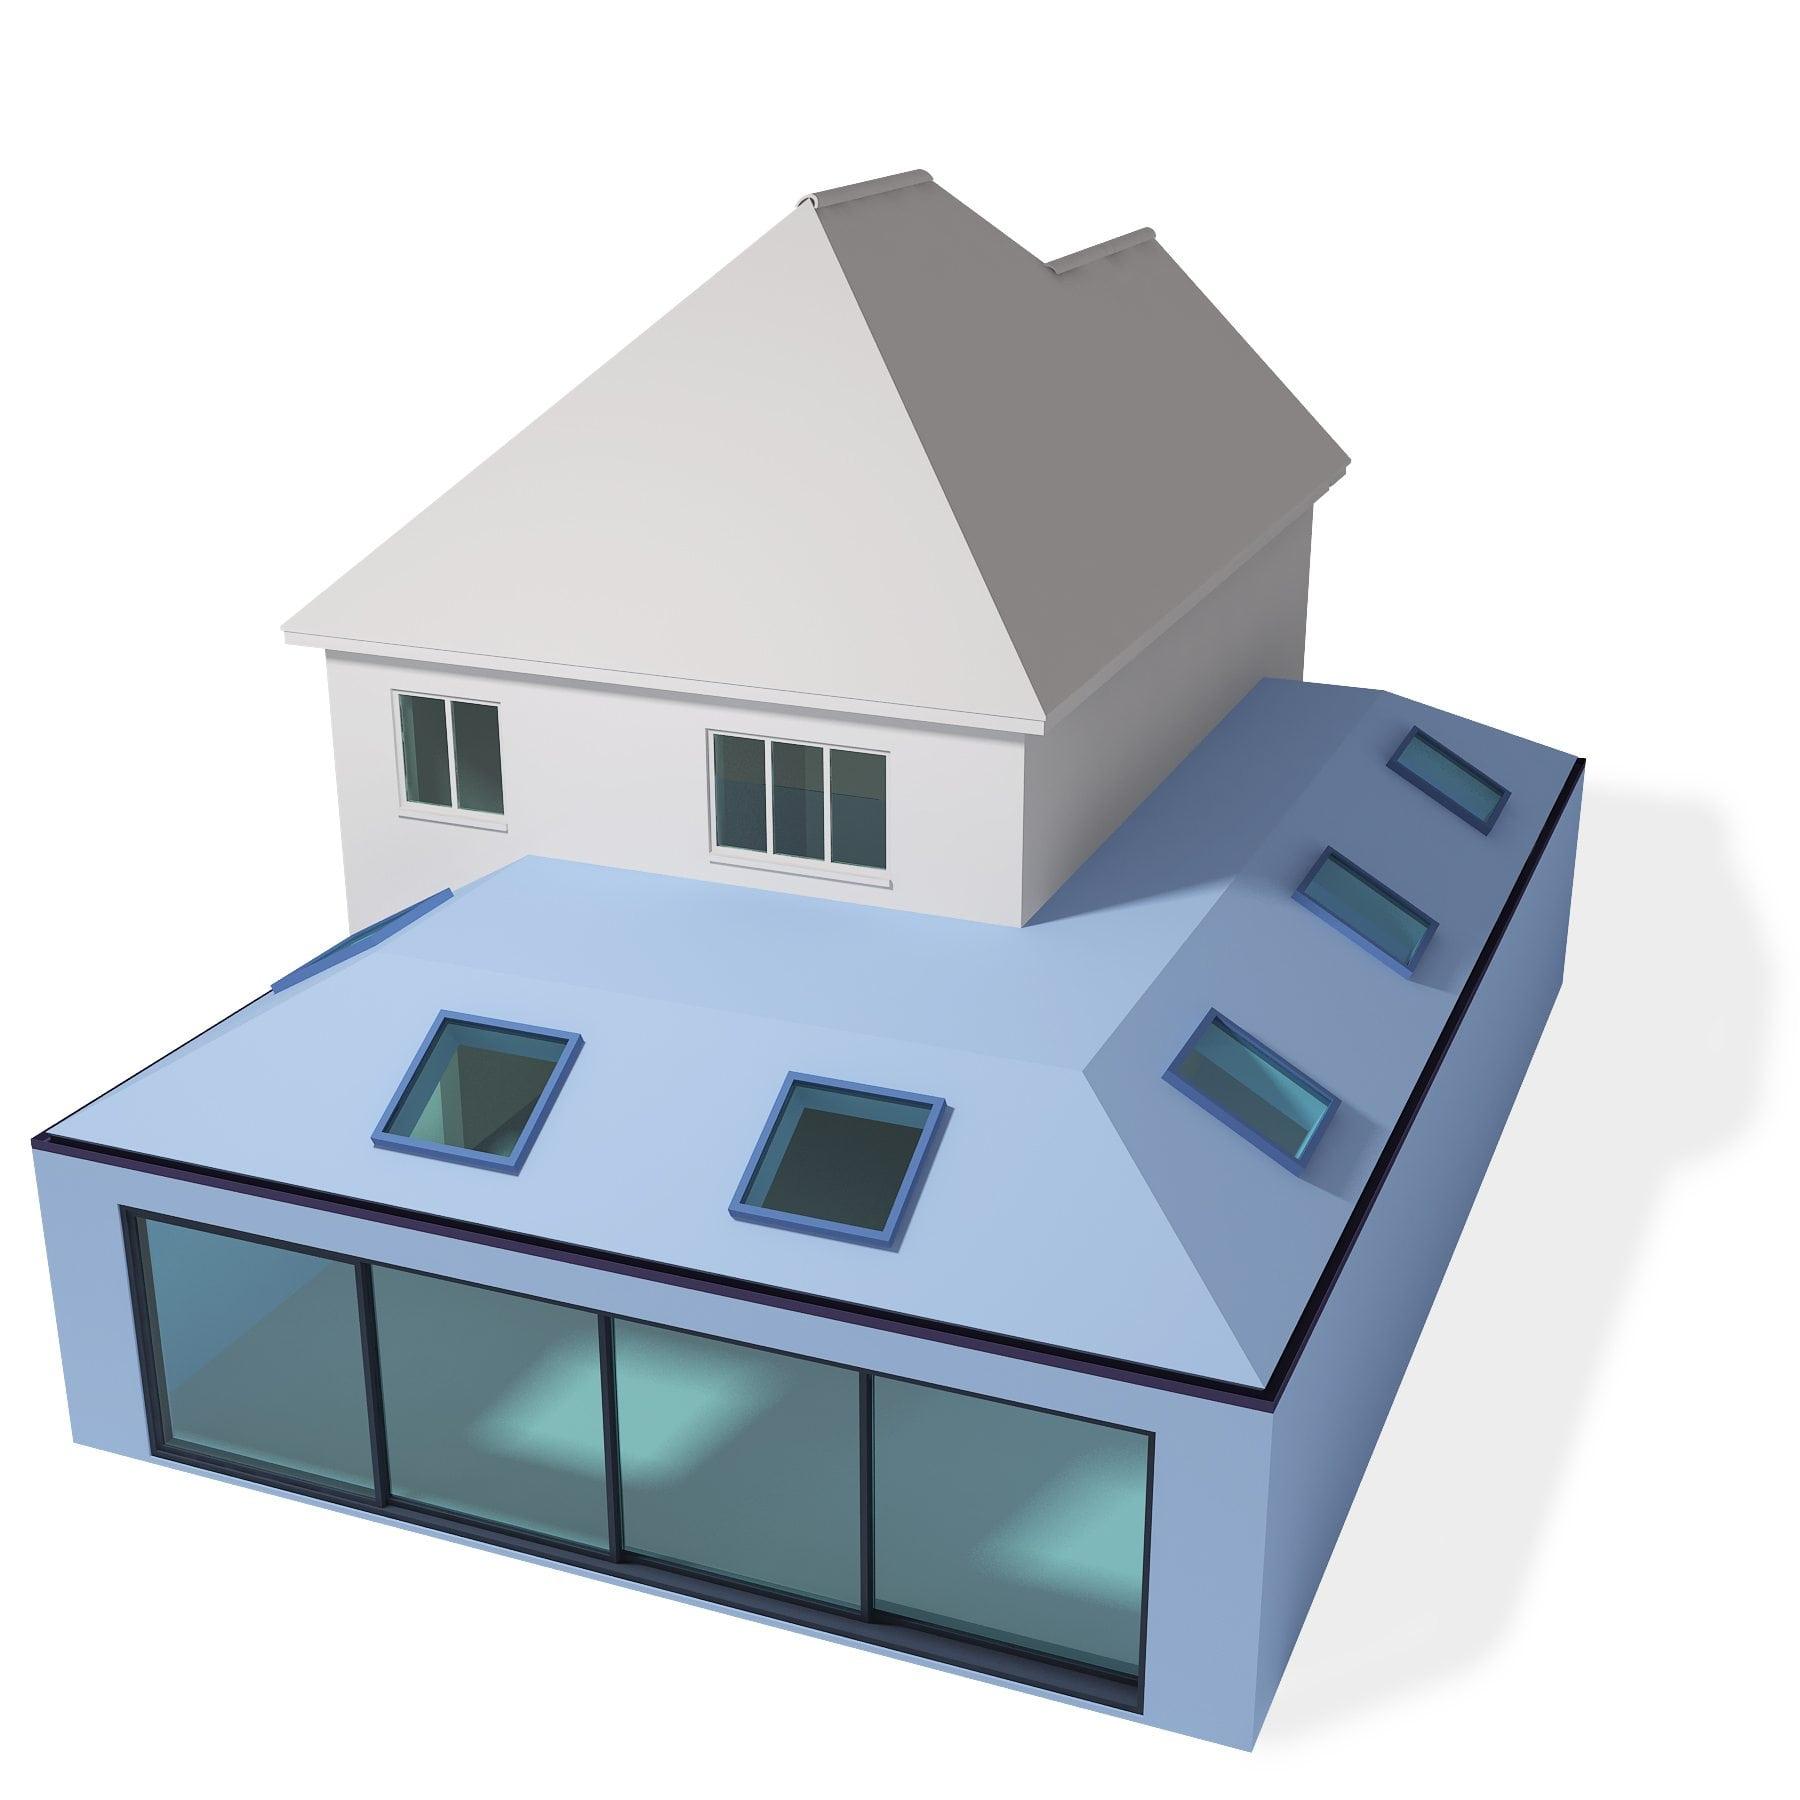 Large Wraparound Extension Plus Rooms